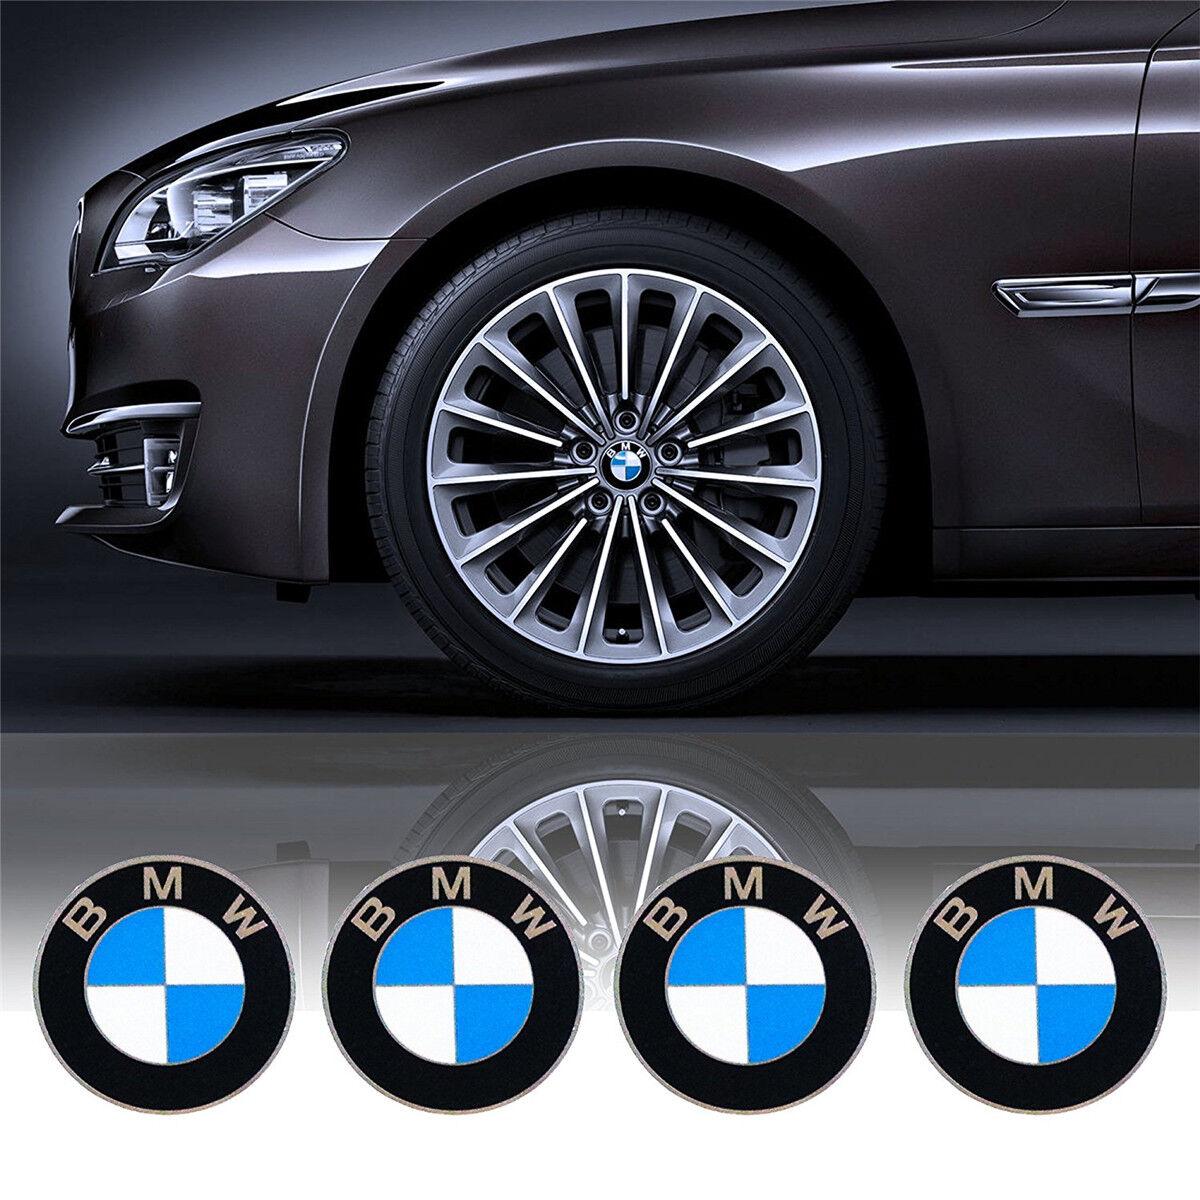 4X BMW 68mm NABENDECKEL RADNABENDECKEL NABENKAPPEN RADKAPPE FELGENDECKEL EMBLEME